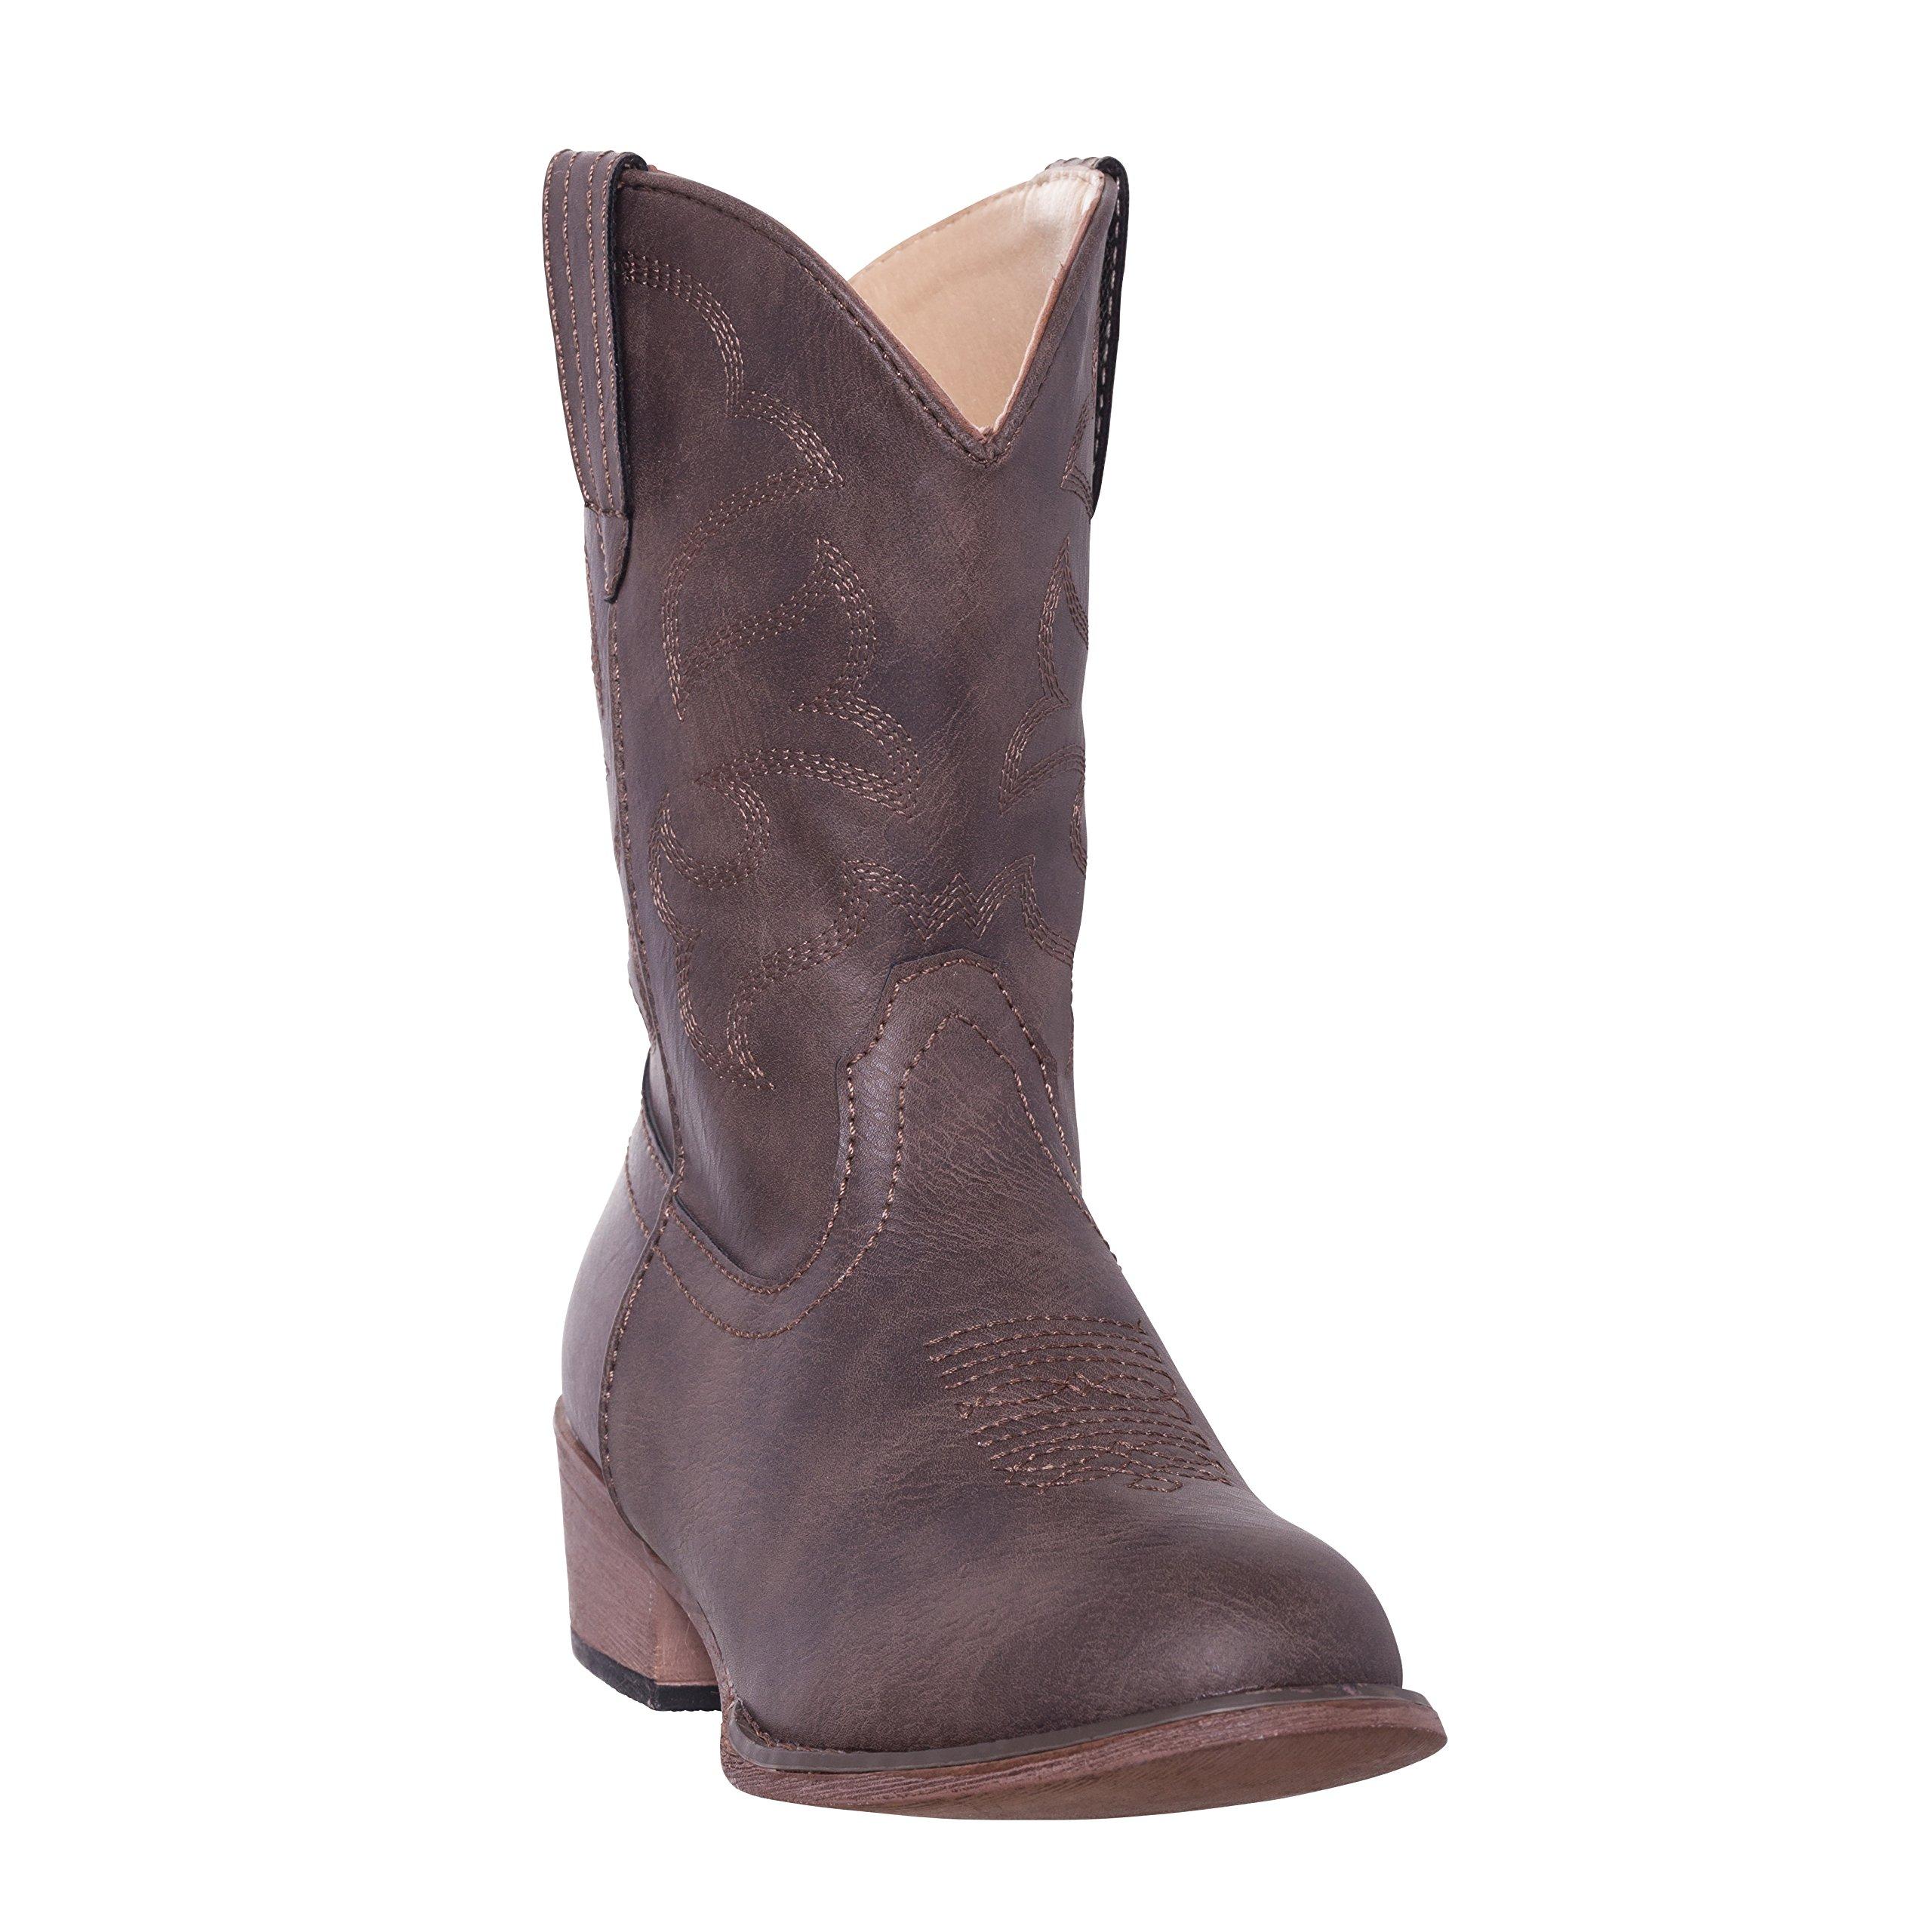 Children Western Kids Cowboy Boot,Distressed Brown,8 M US Toddler